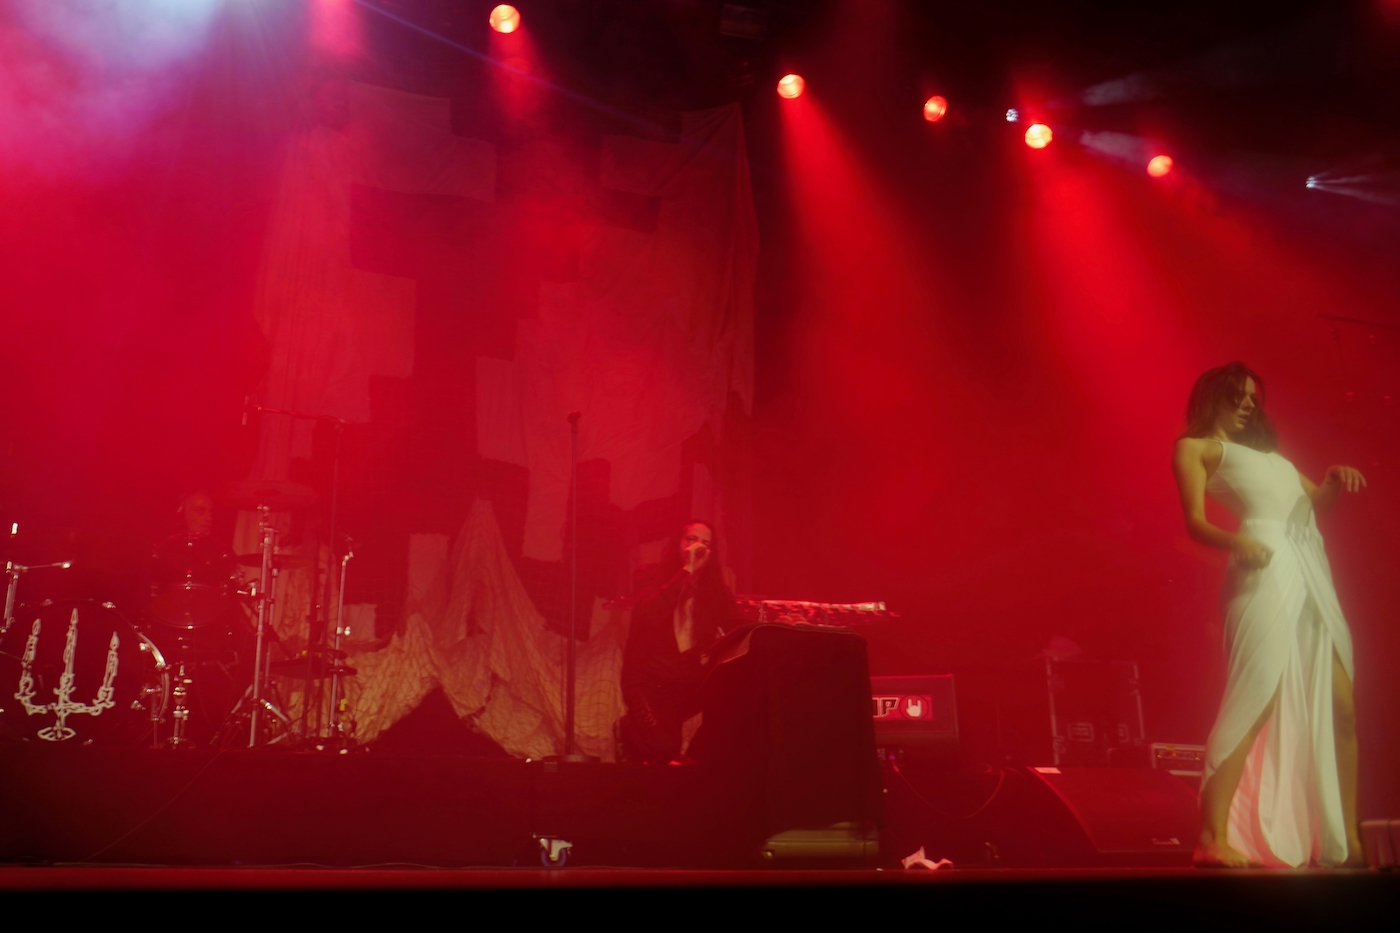 mark_benecke_amphi_festival_koeln_cologne_tanzbrunnen_gothic_OMD_oomph_agonoize_mono_inc_es23_sitd_solar_fake - 168.jpg